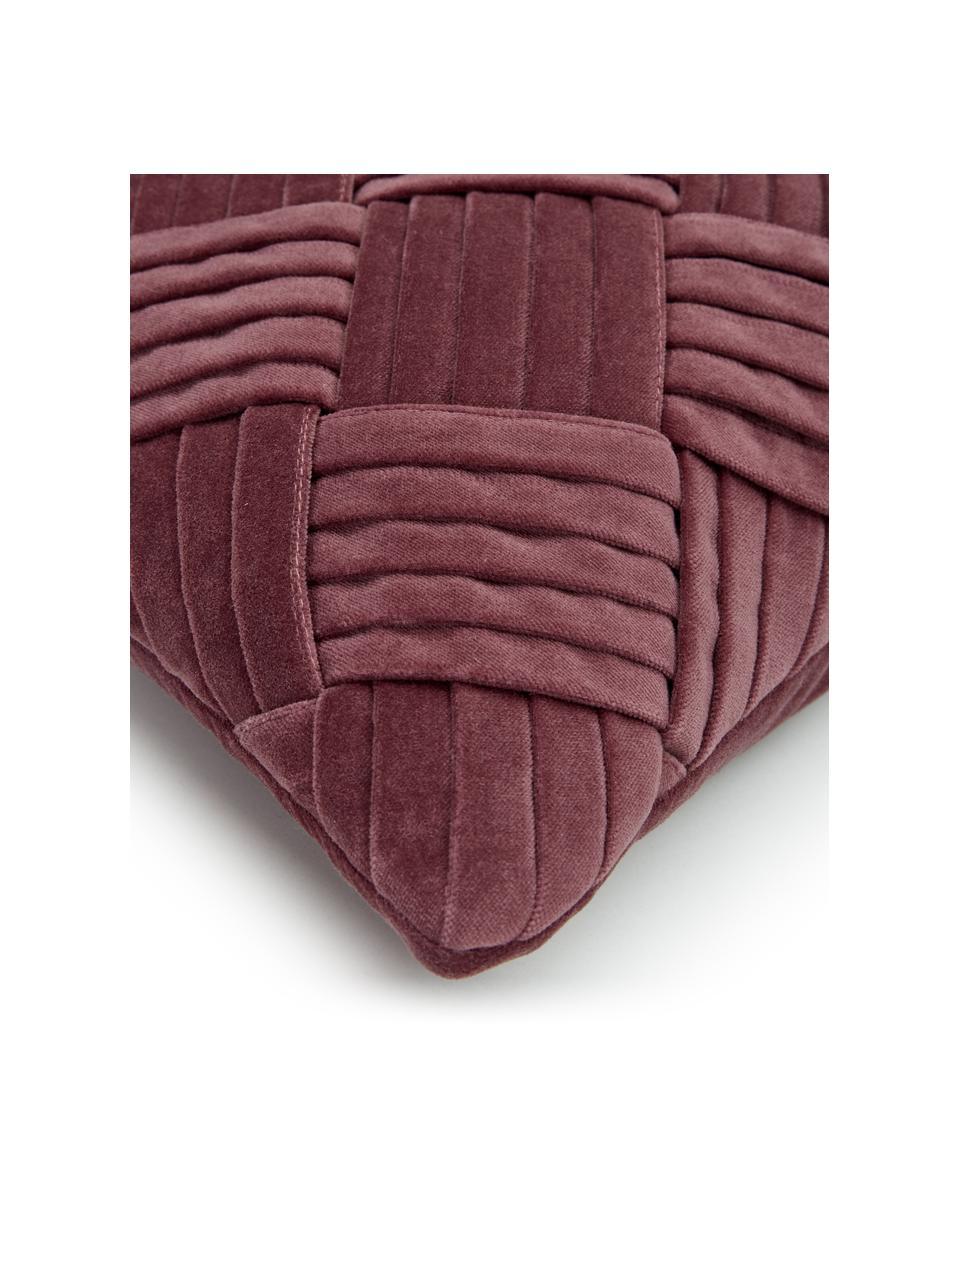 Fluwelen kussenhoes Sina in oudroze met structuurpatroon, Fluweel (100% katoen), Roze, 30 x 50 cm